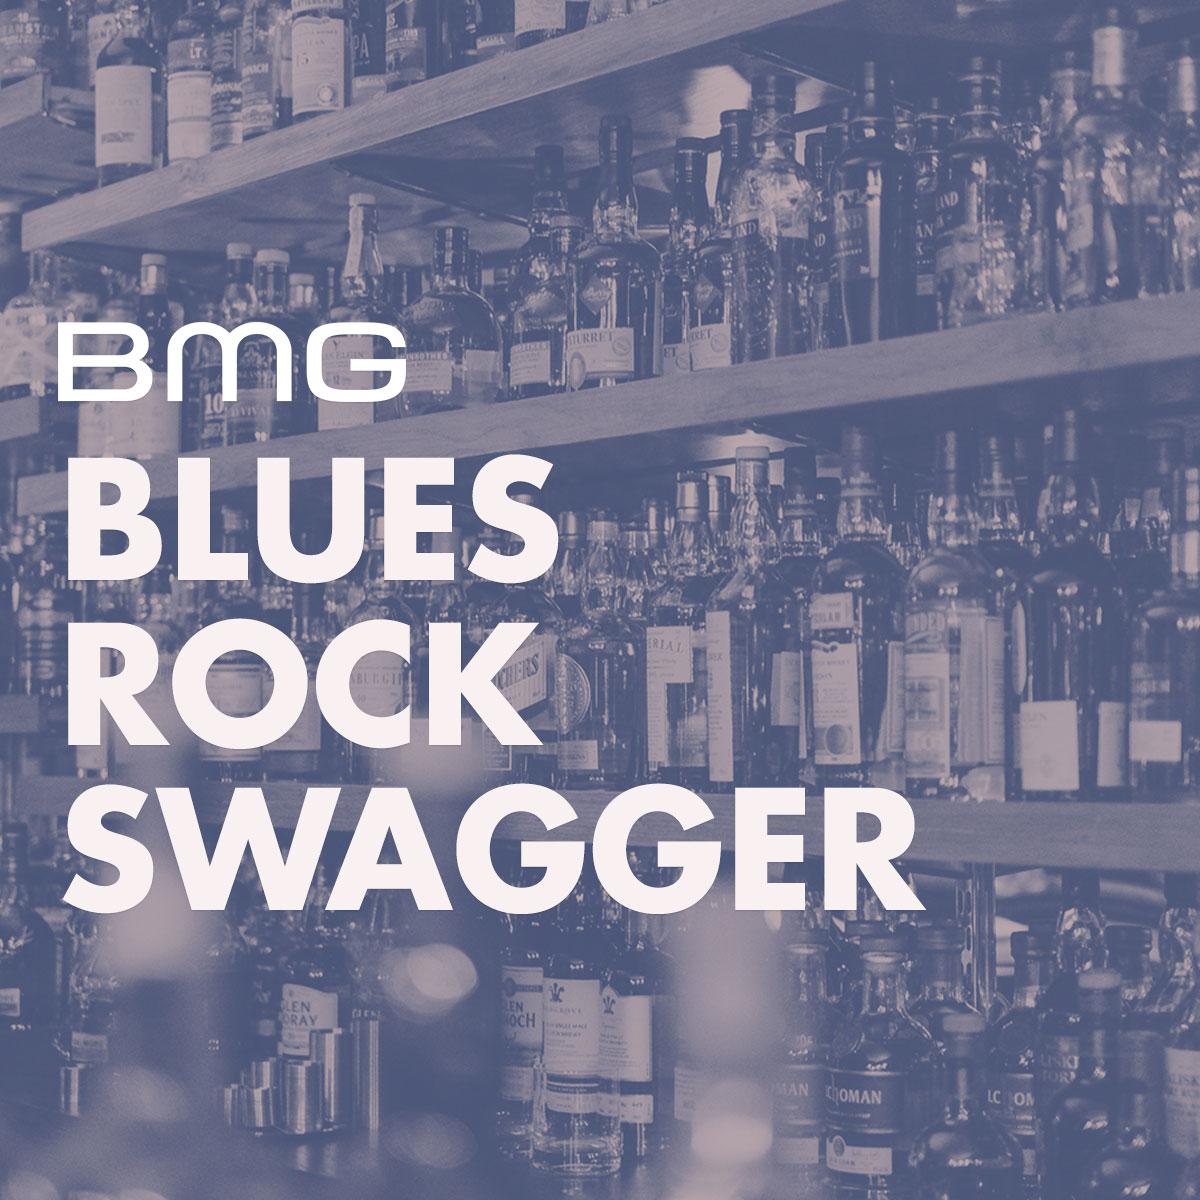 1200-x-1200-Blues-Rock-Swagger.jpg